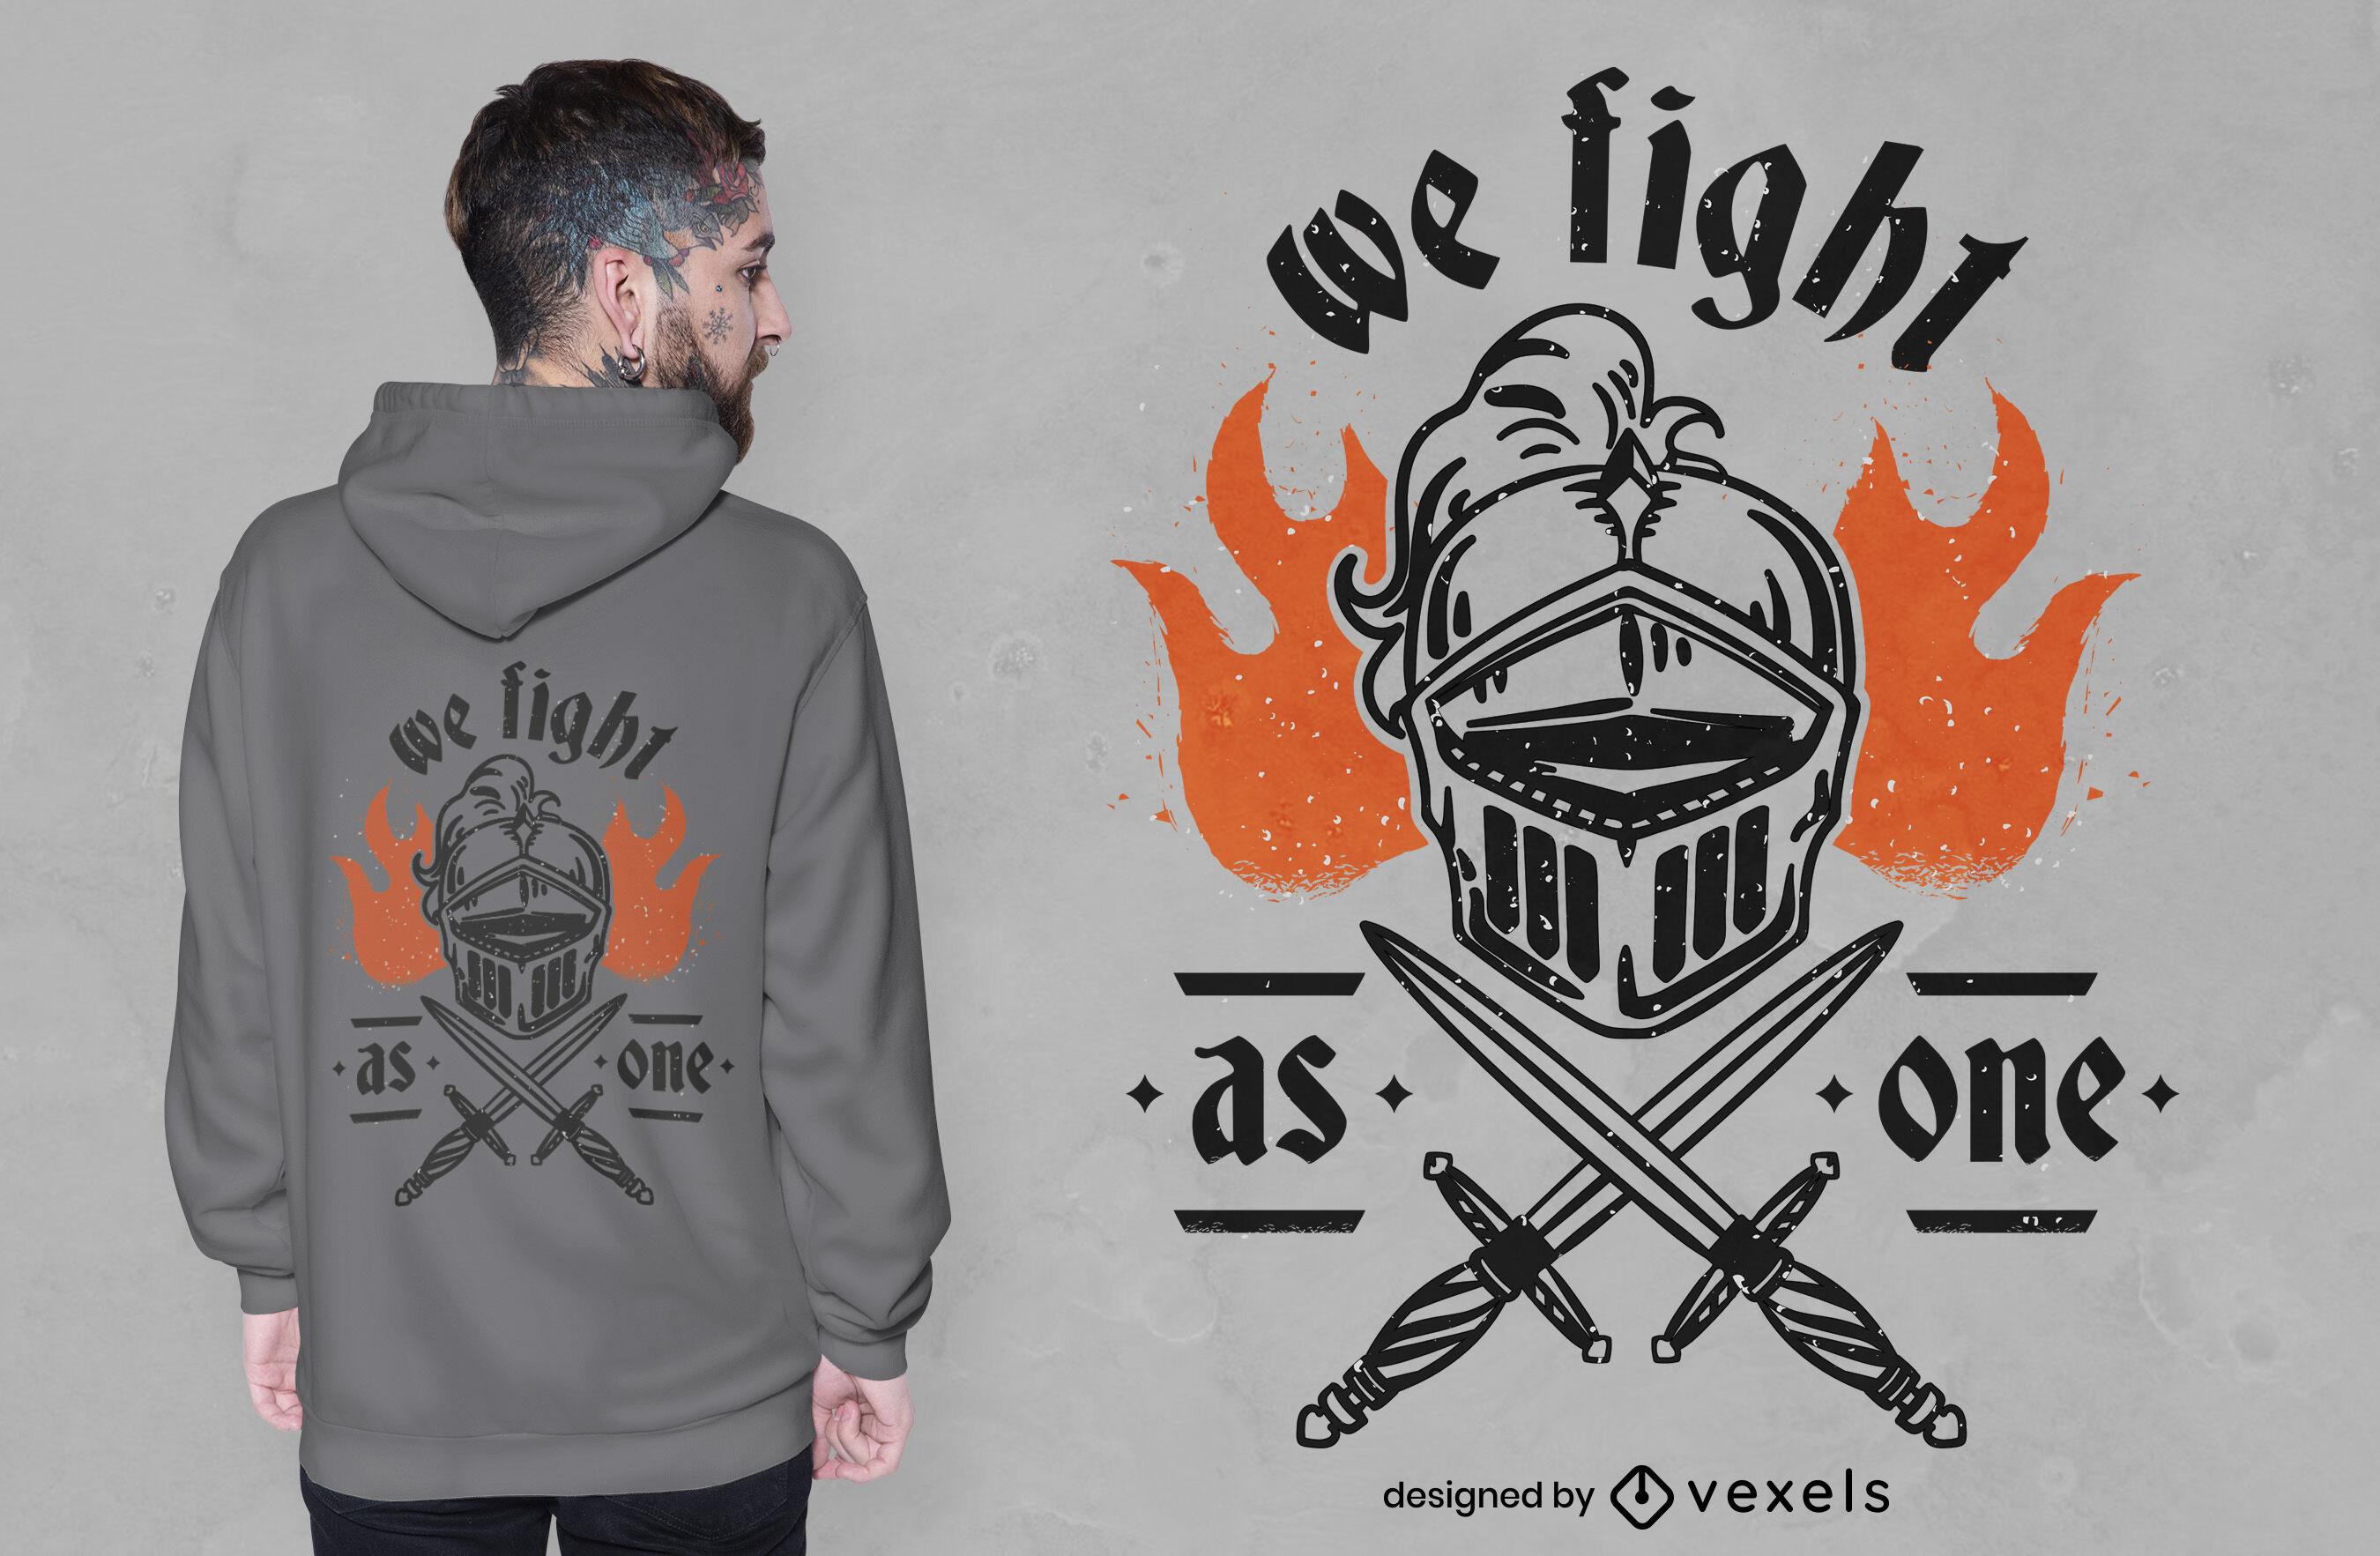 Knight helmet and swords t-shirt design